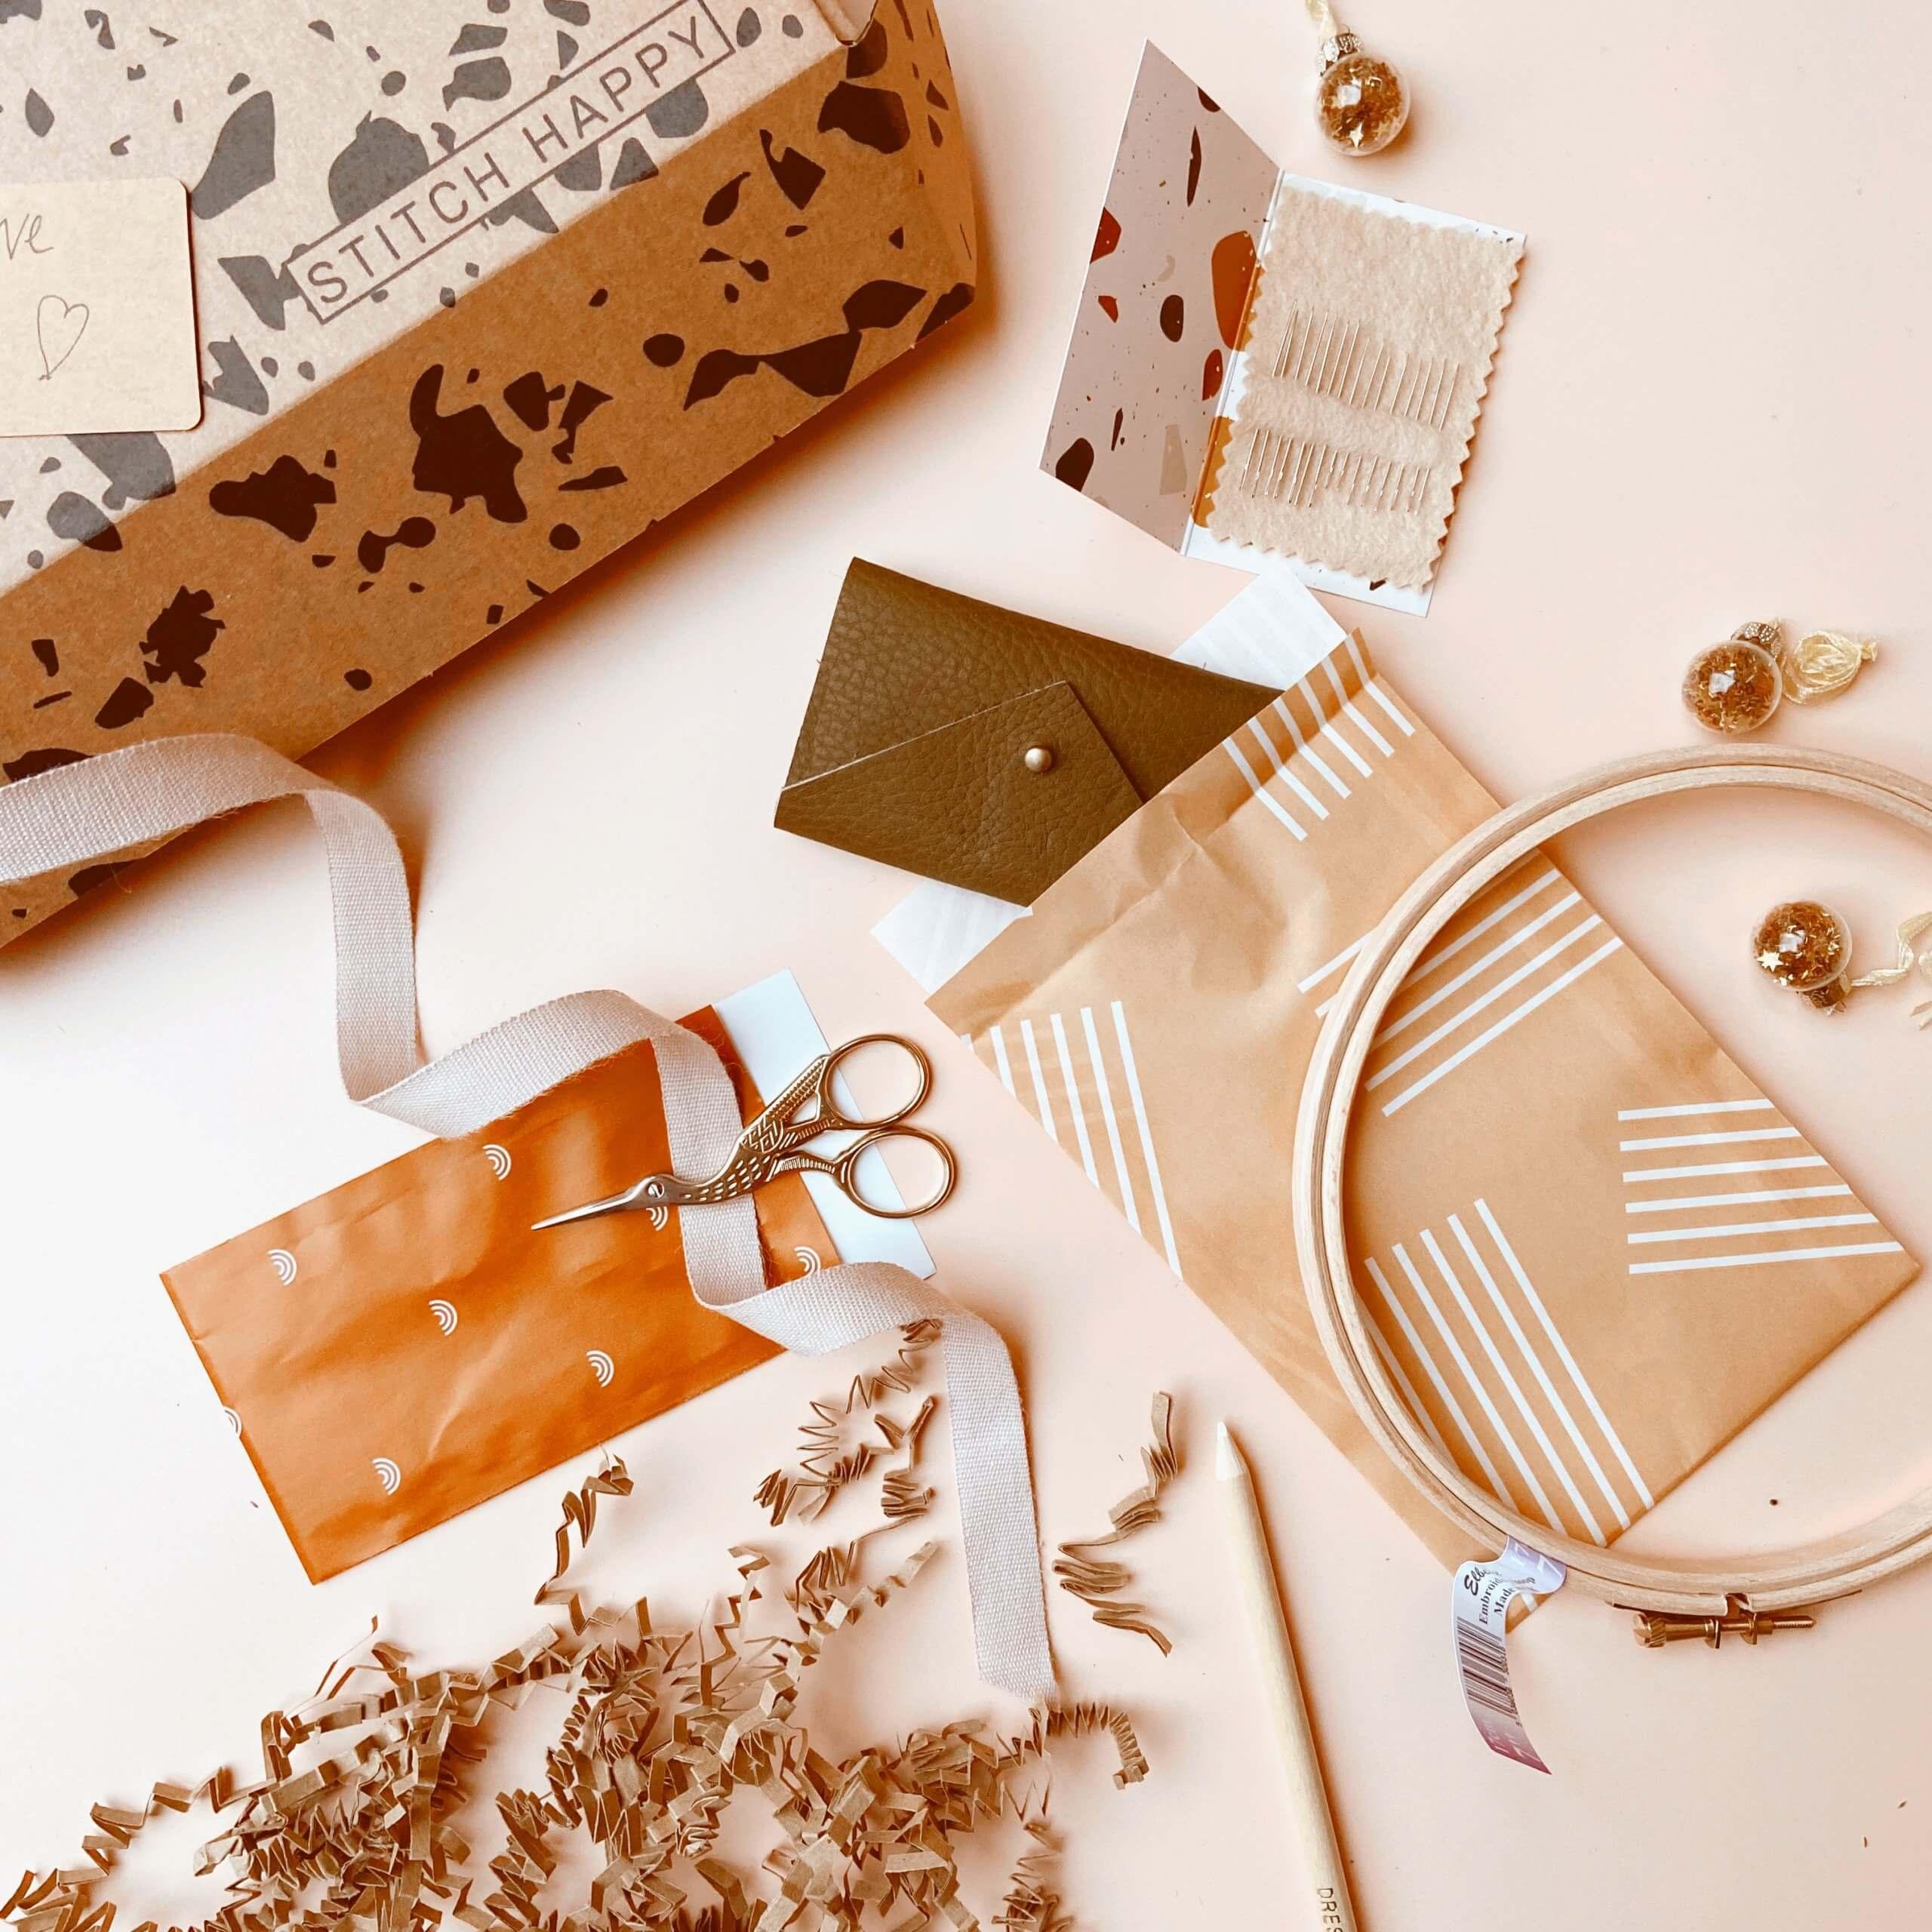 utensilios de costura junto a una caja postal